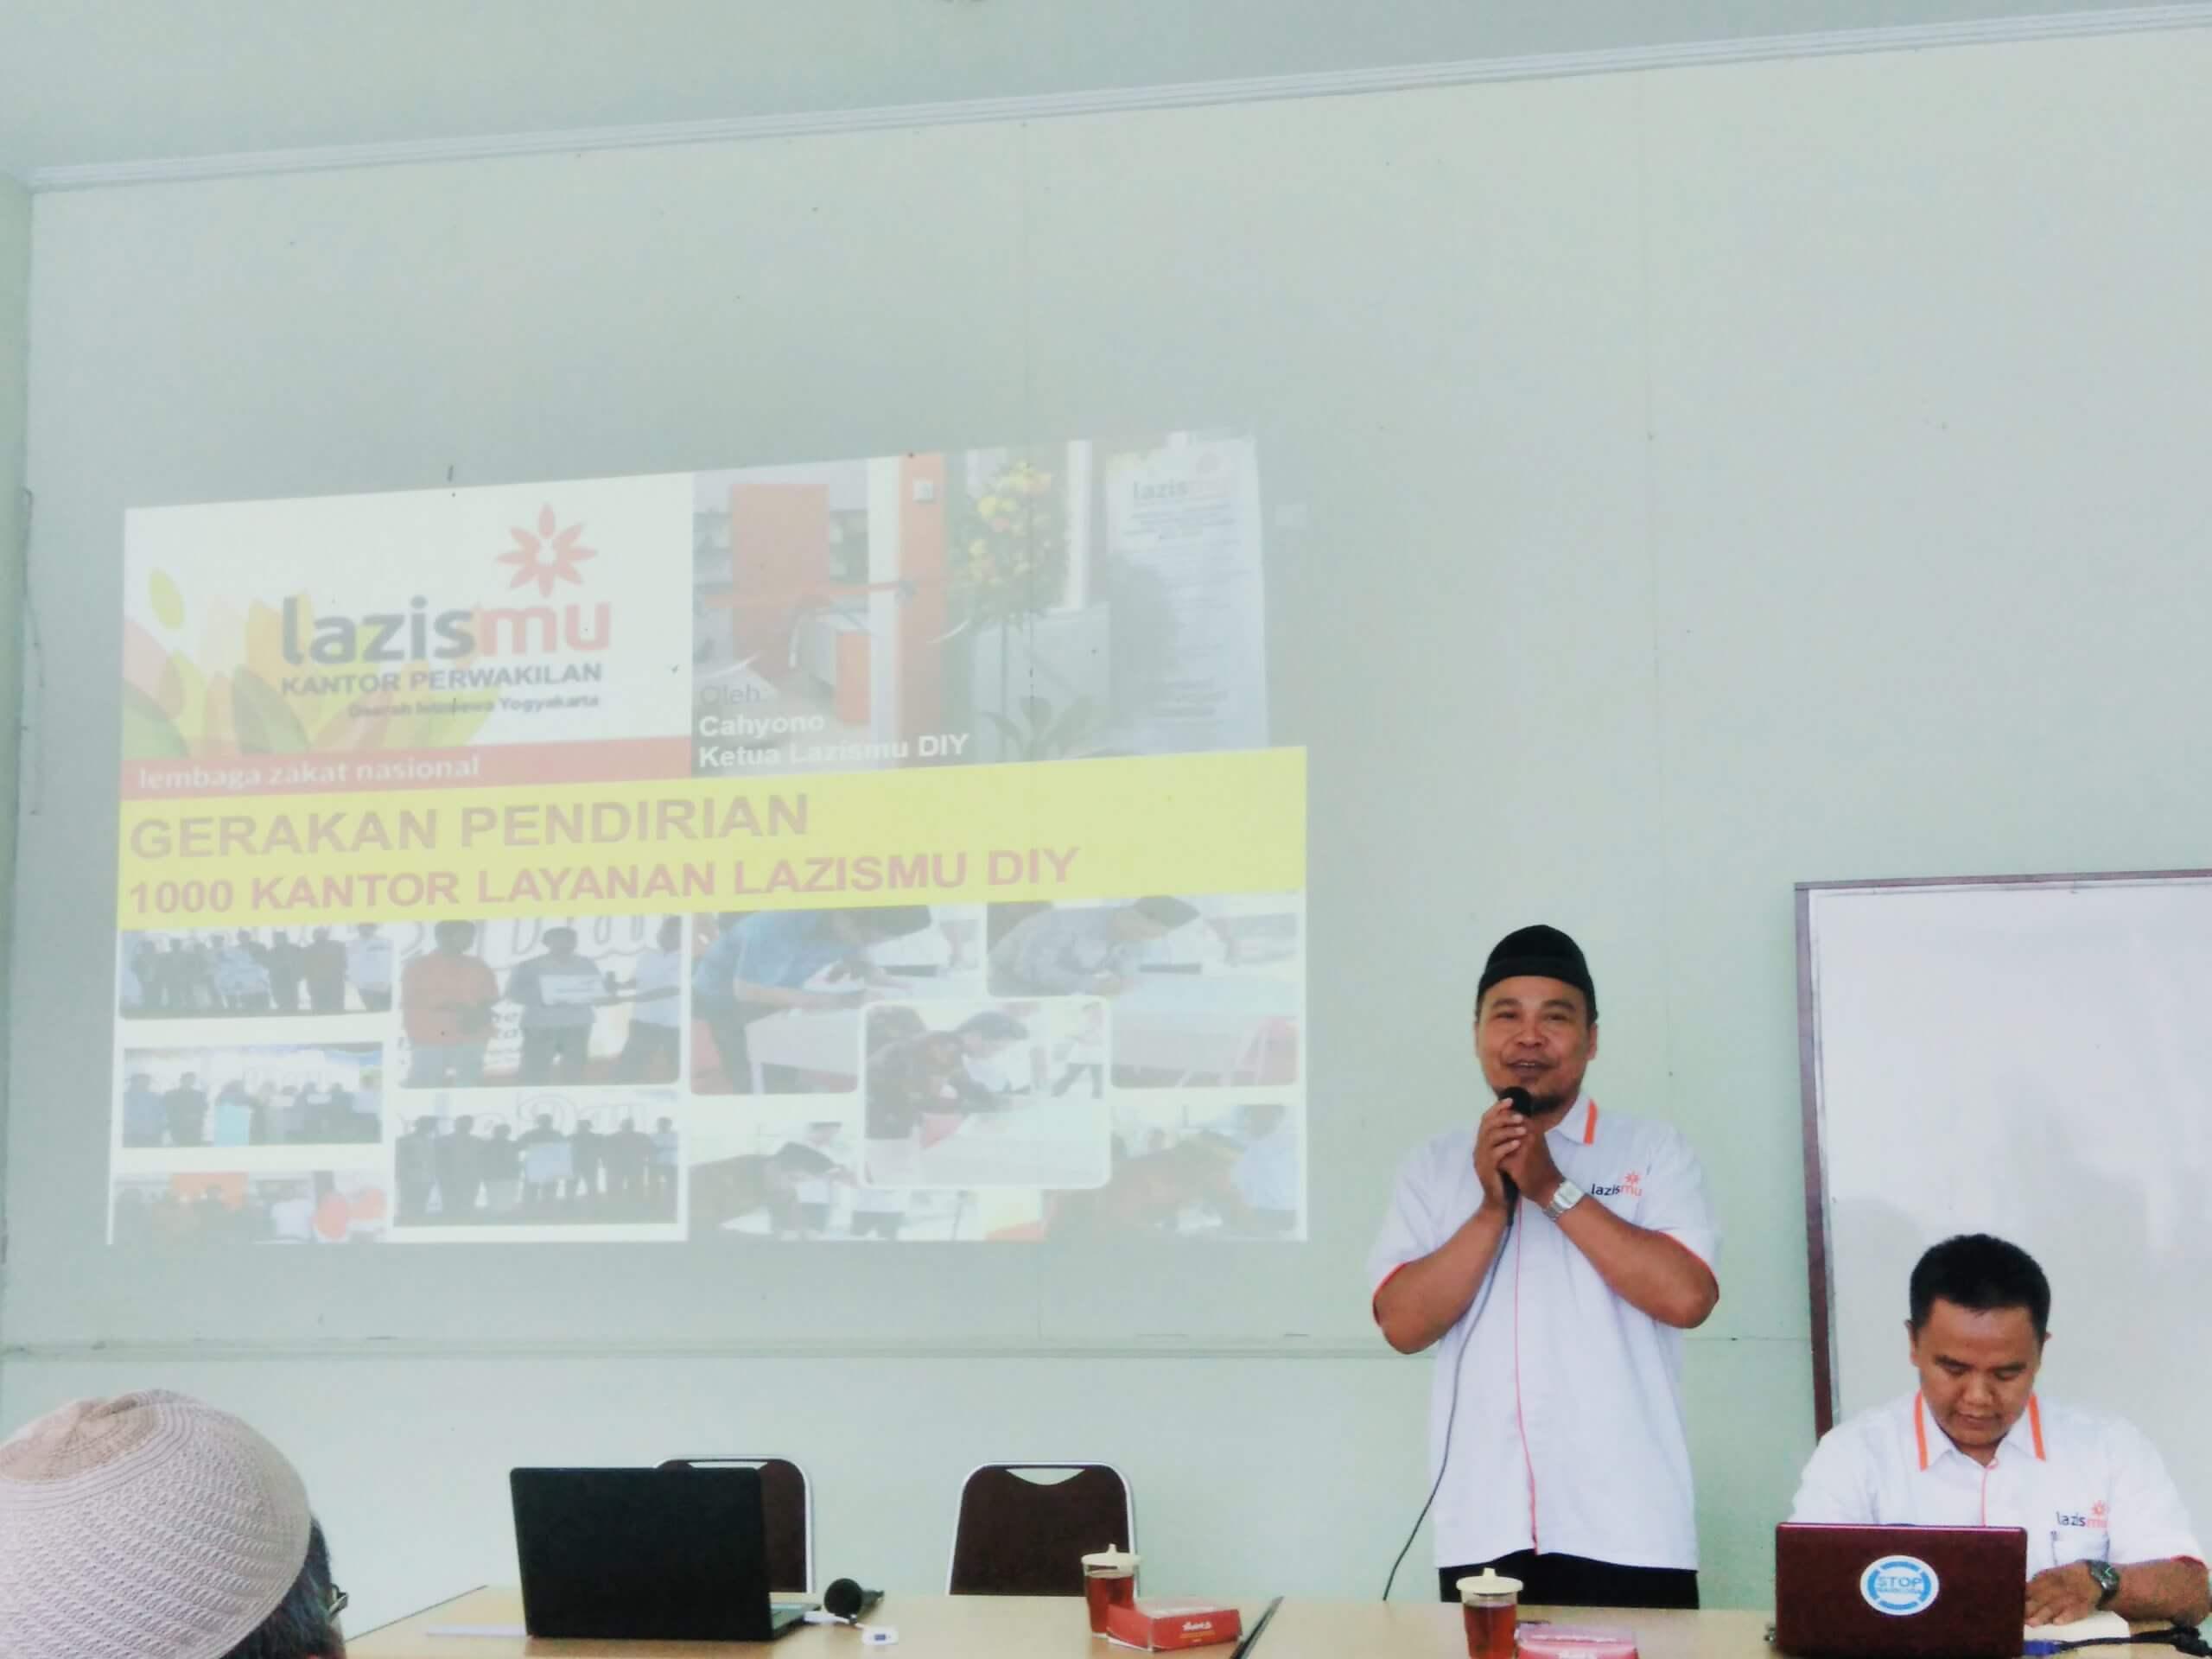 gerakan 1.000 kantor layanan. oleh cahyono S.Ag dan Jefree Fahana, ST., M. Kom. menjelaskan gerakan 1000 kantor layanan dalam RAKOR Lazismu DIY di BMT Arafah Wates Kulonprogro